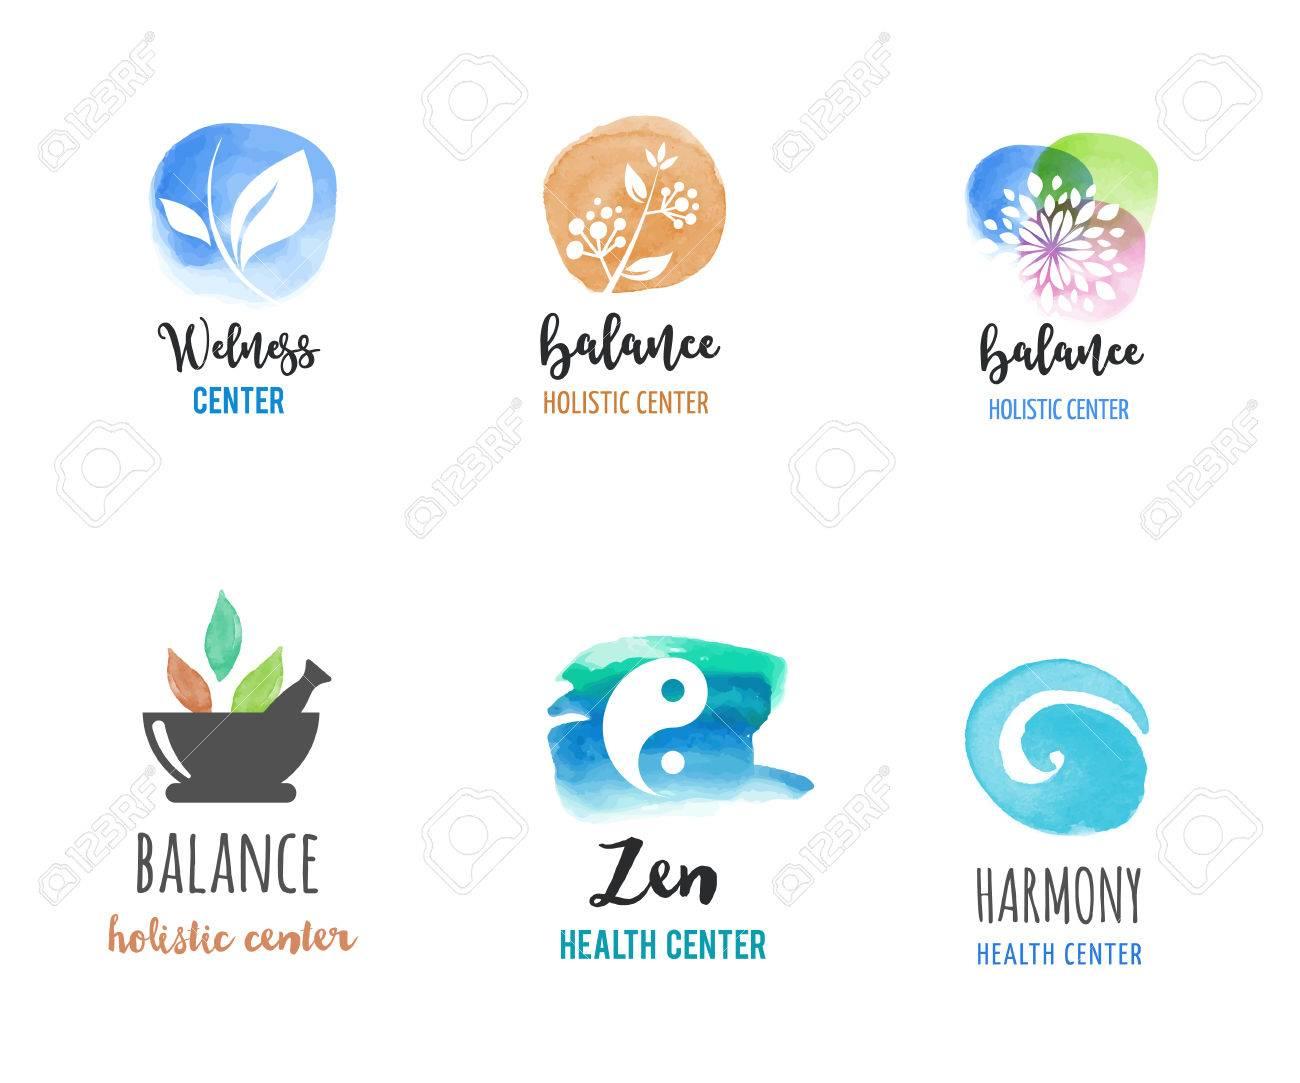 Alternative medicine and wellness, yoga, zen meditation concept - vector watercolor icons, logos - 59742759